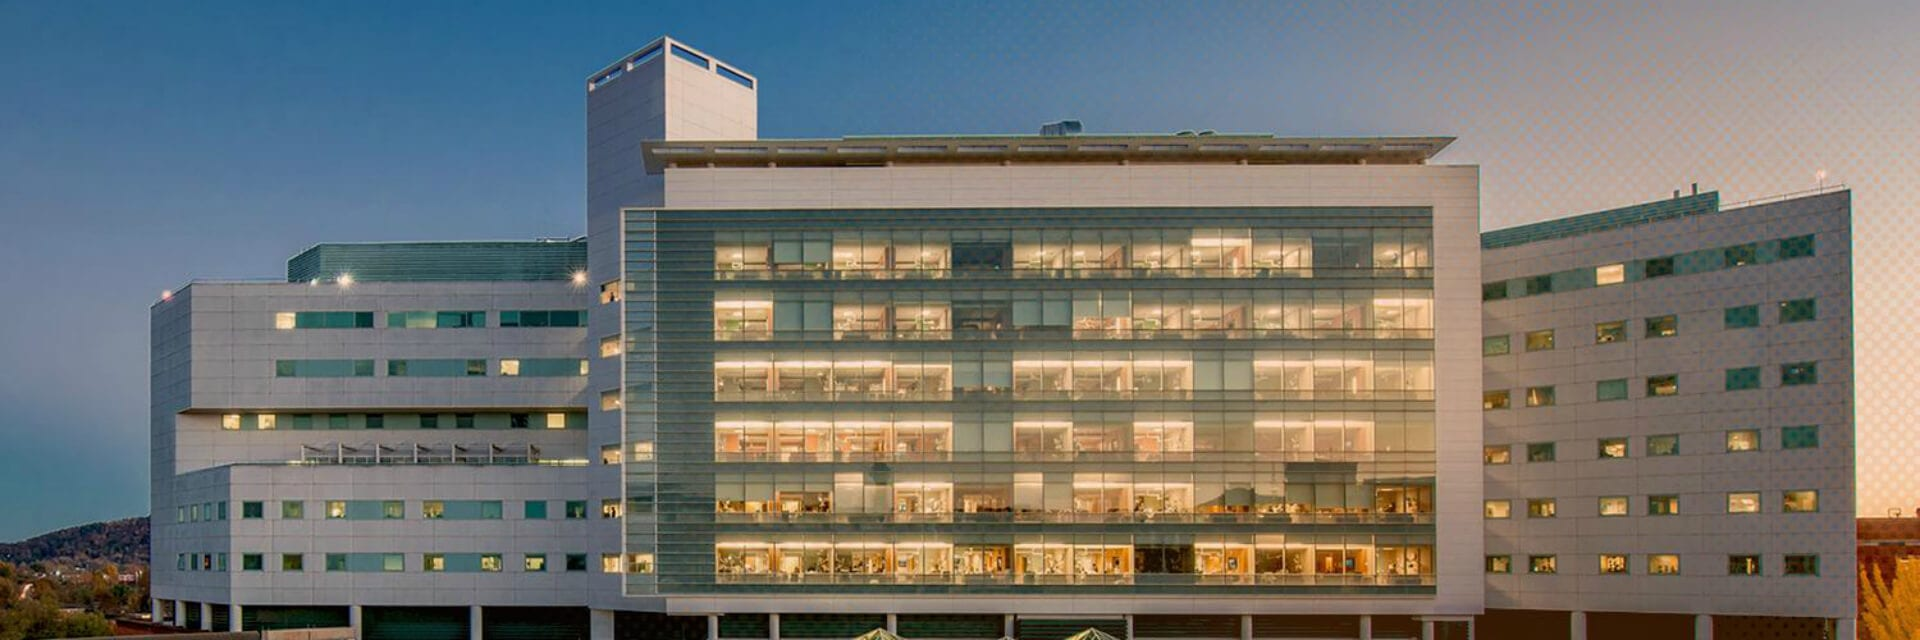 University of Virginia Medical Center Success Story